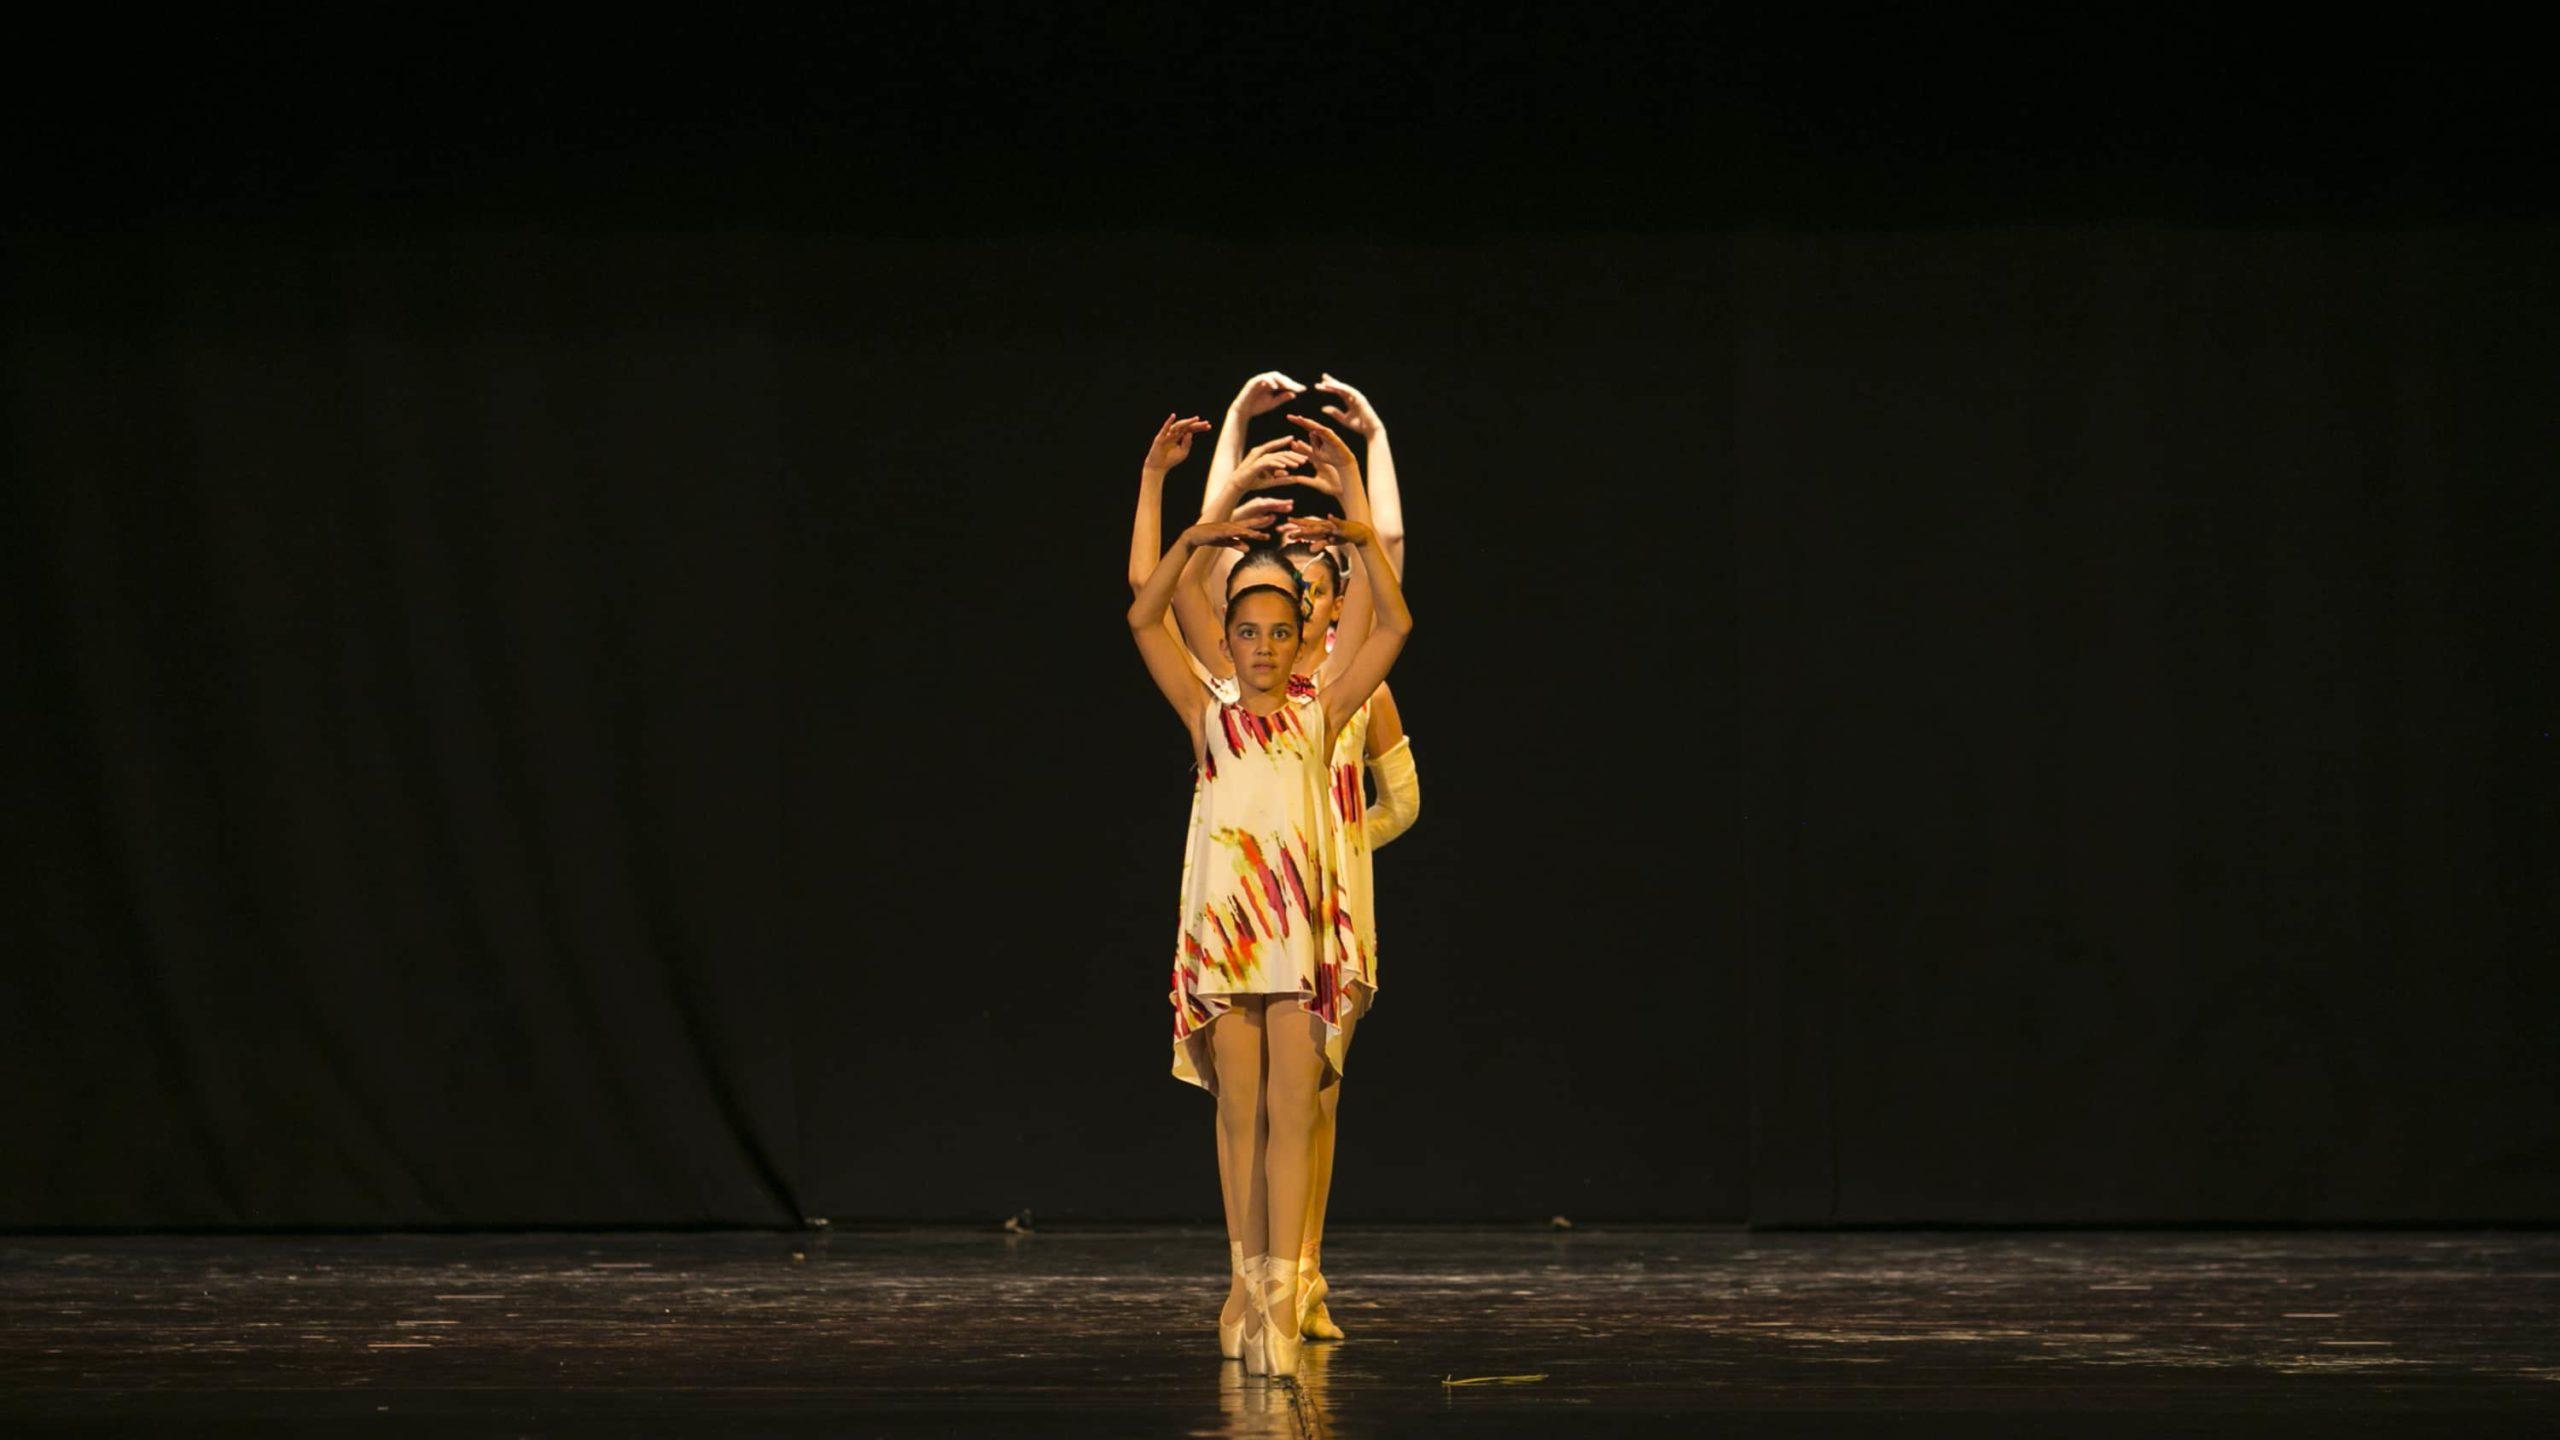 poetar-danzando-22@0.5x